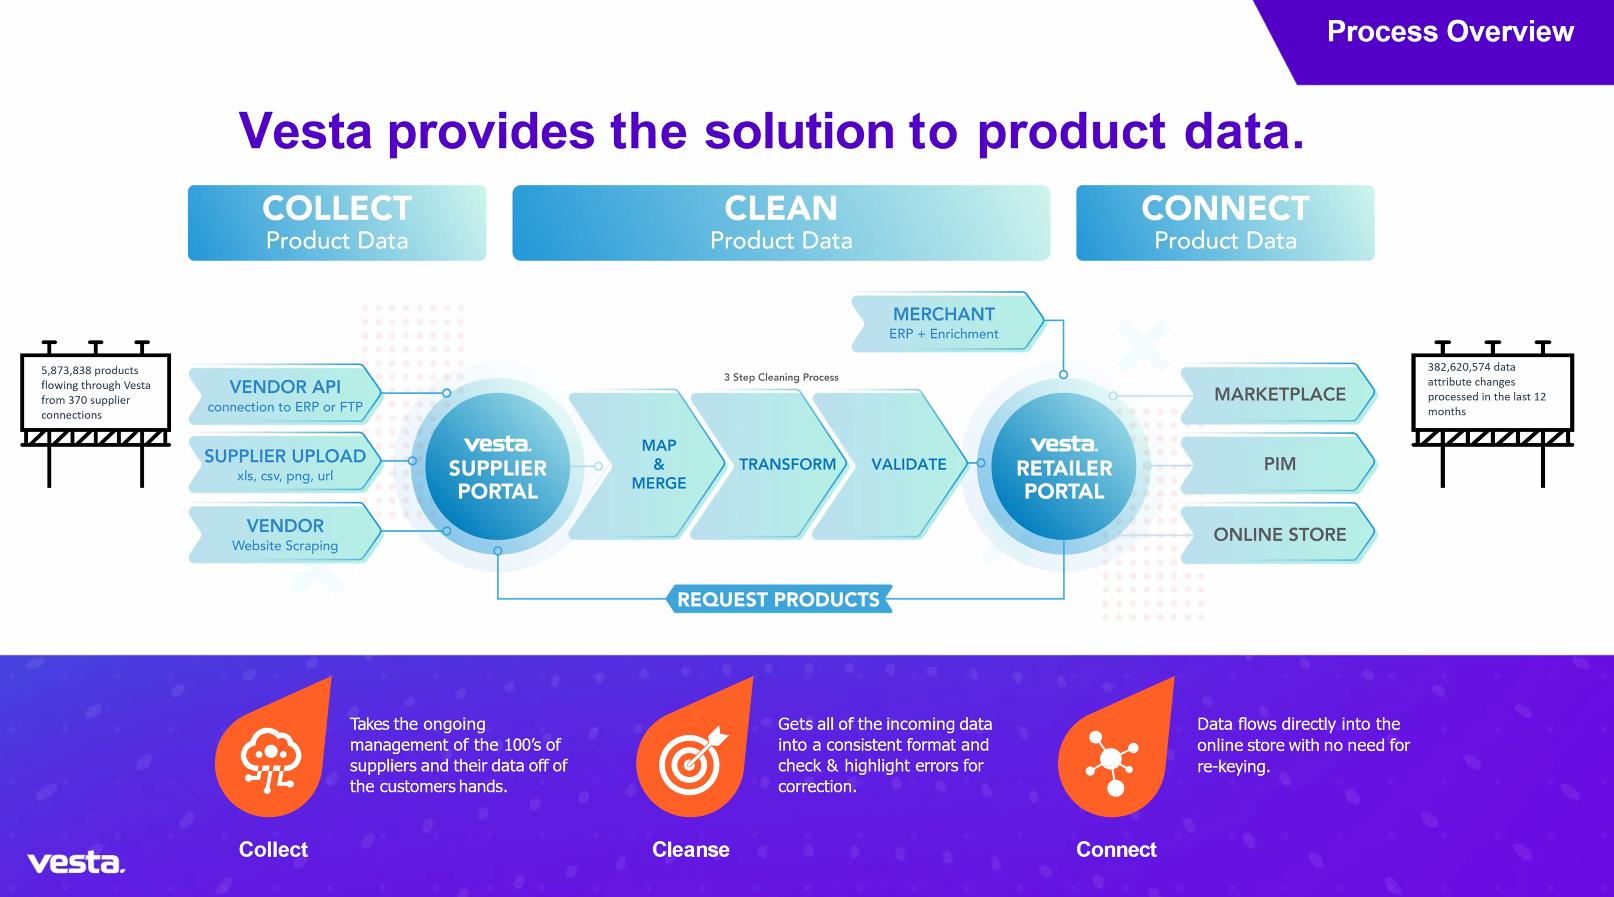 Vesta Process and Platform Overview